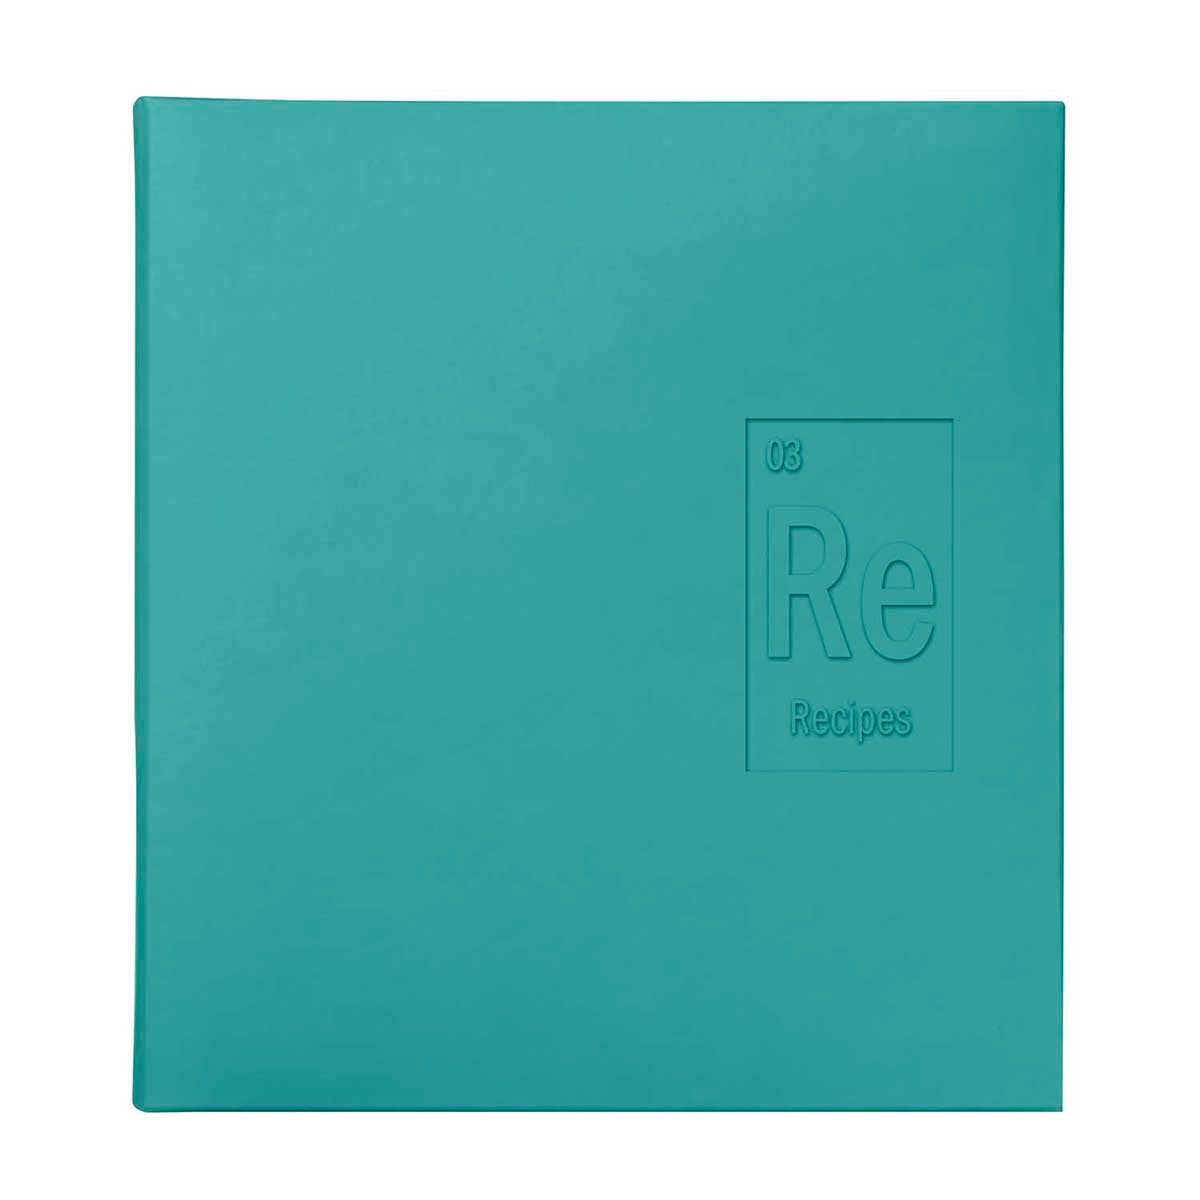 Chemistry-themed recipe book